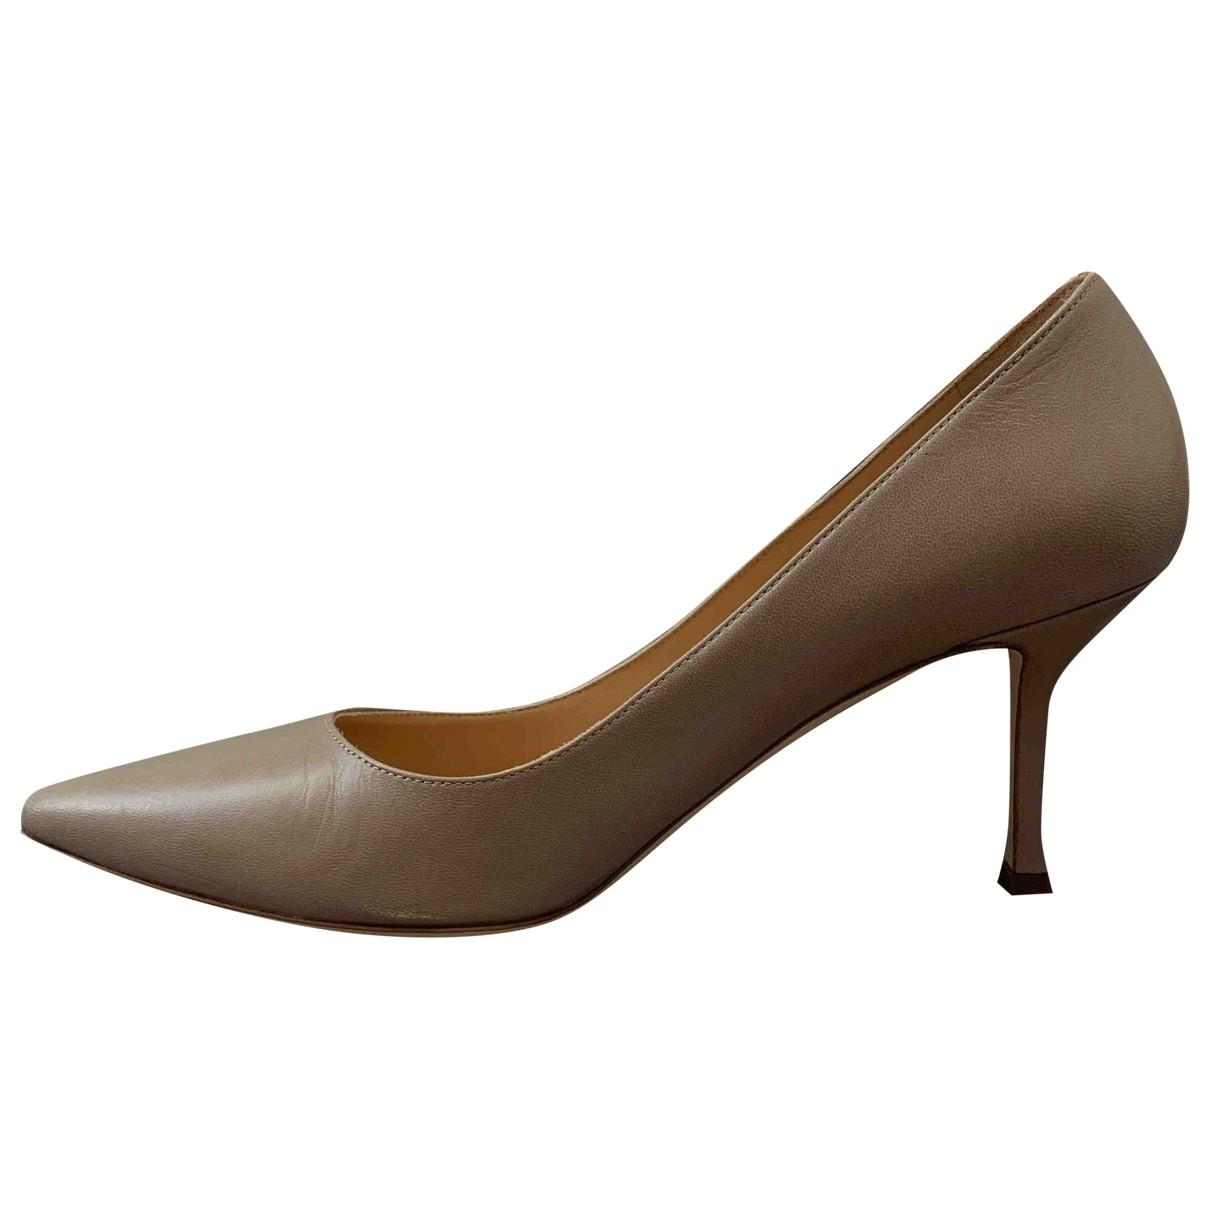 Sergio Rossi - Escarpins   pour femme en cuir - beige